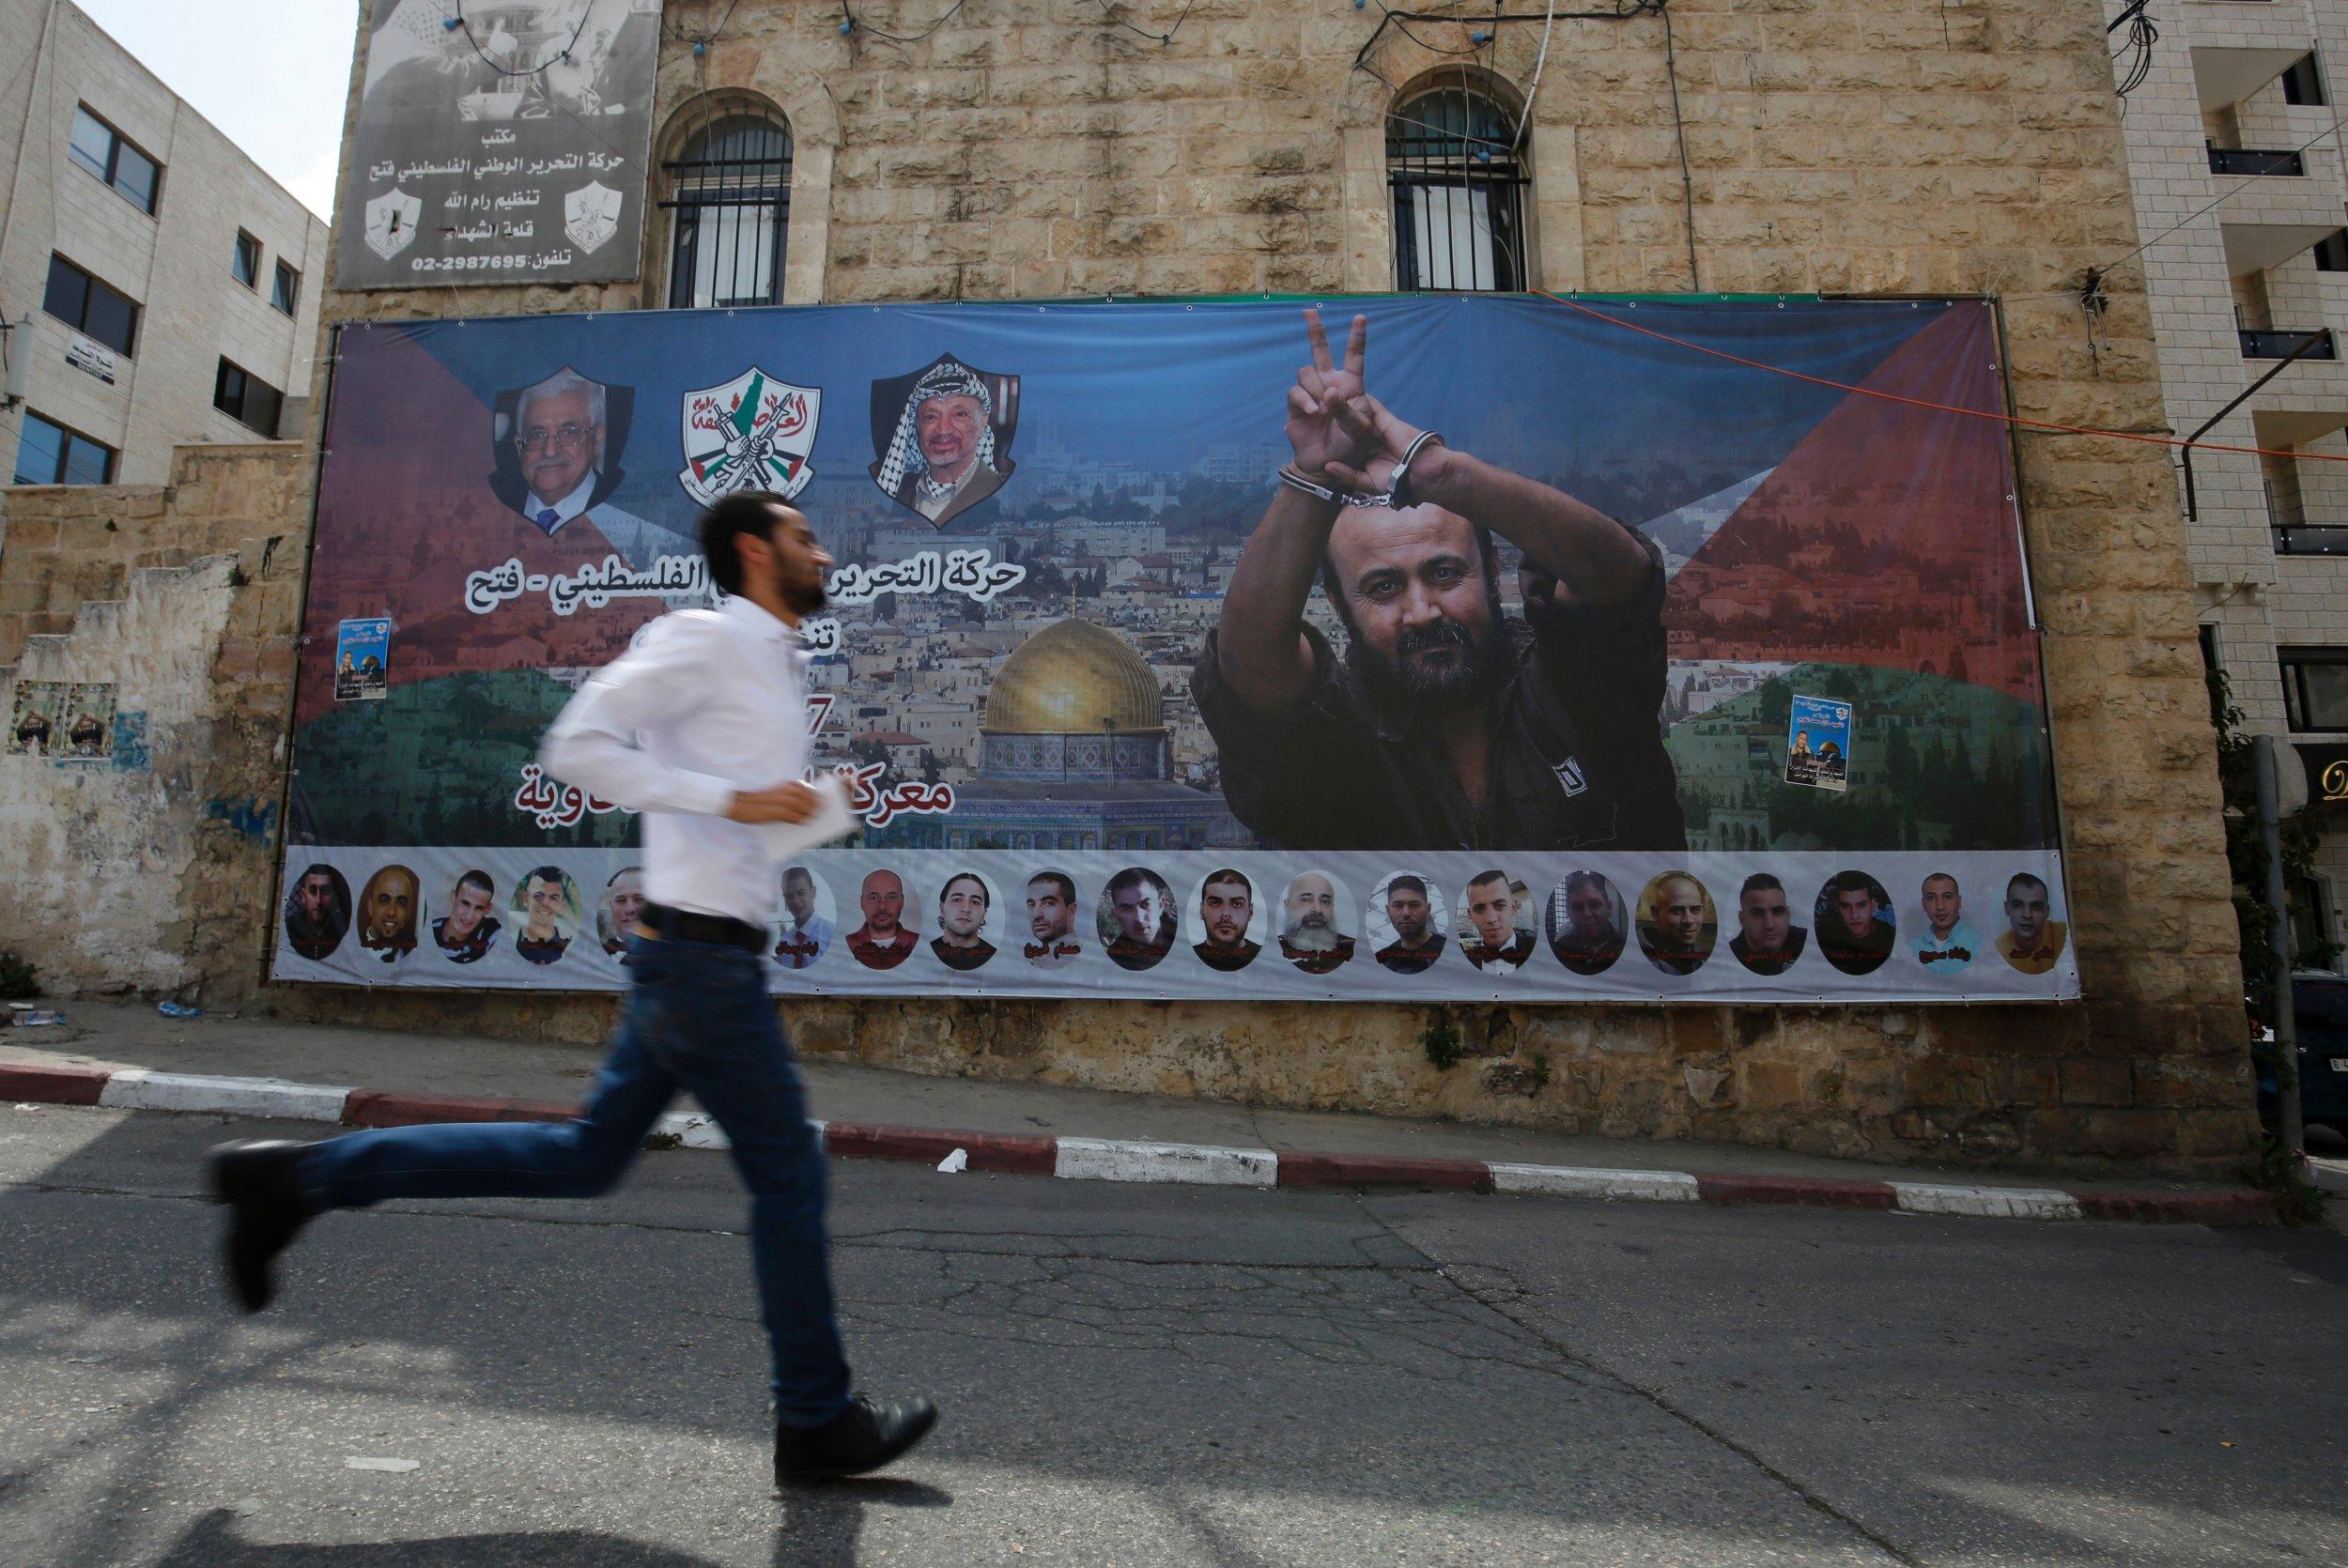 Palestinian prisoner mural